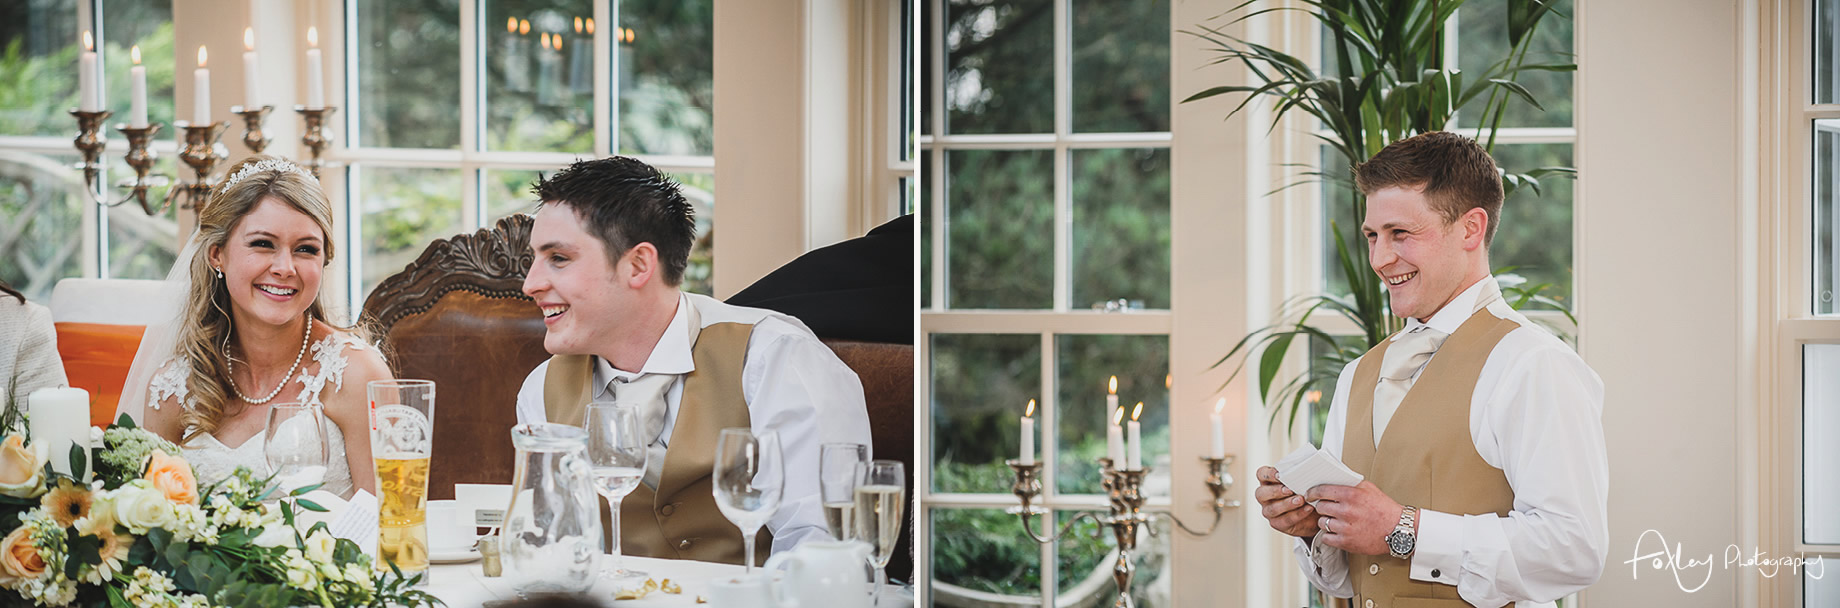 Gemma and Lewis' Wedding at Mitton Hall 137